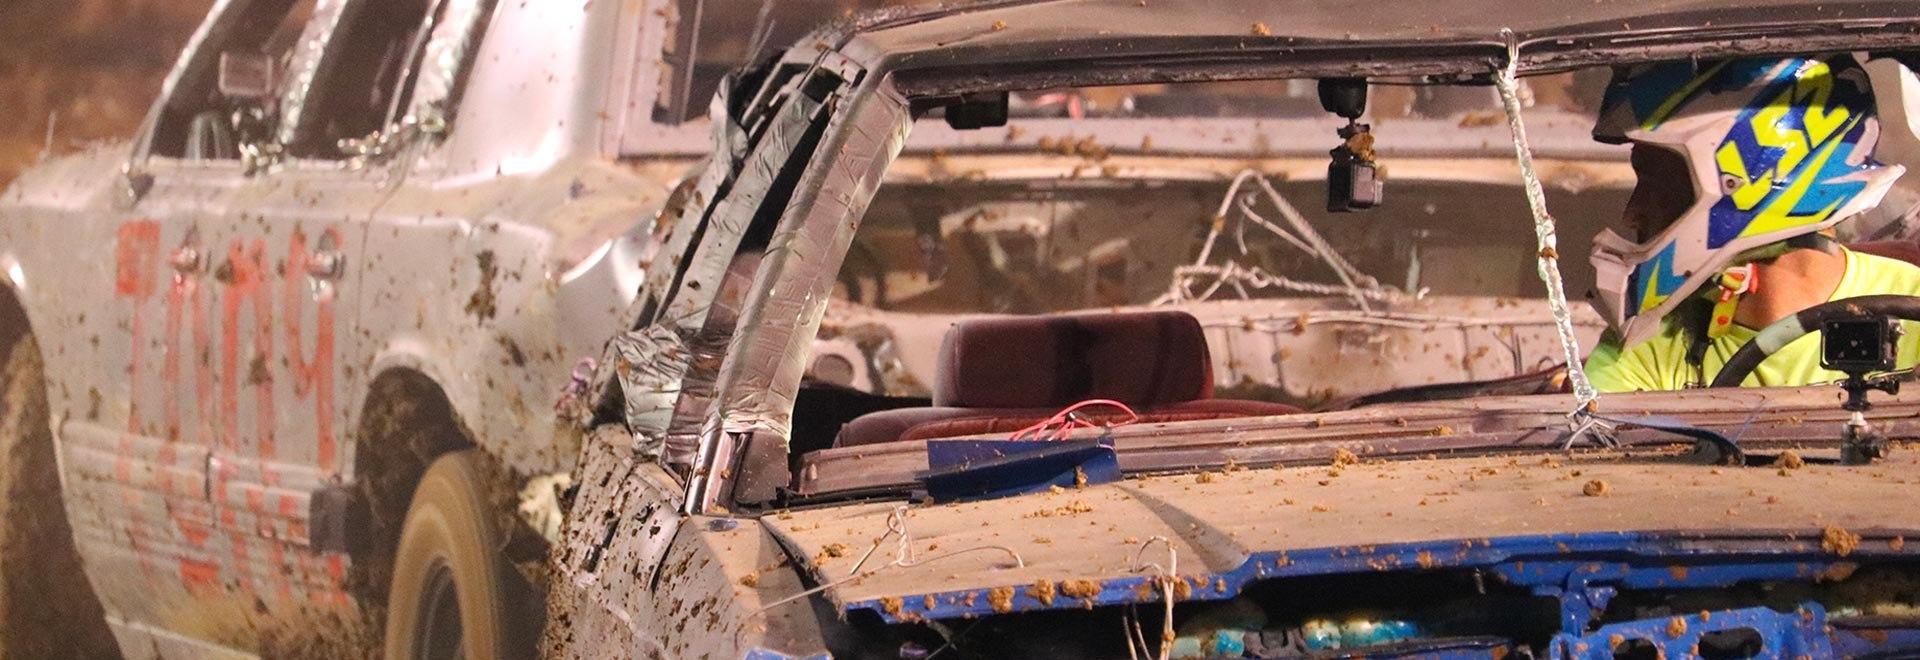 Demolition Derby: la guerra dei catorci